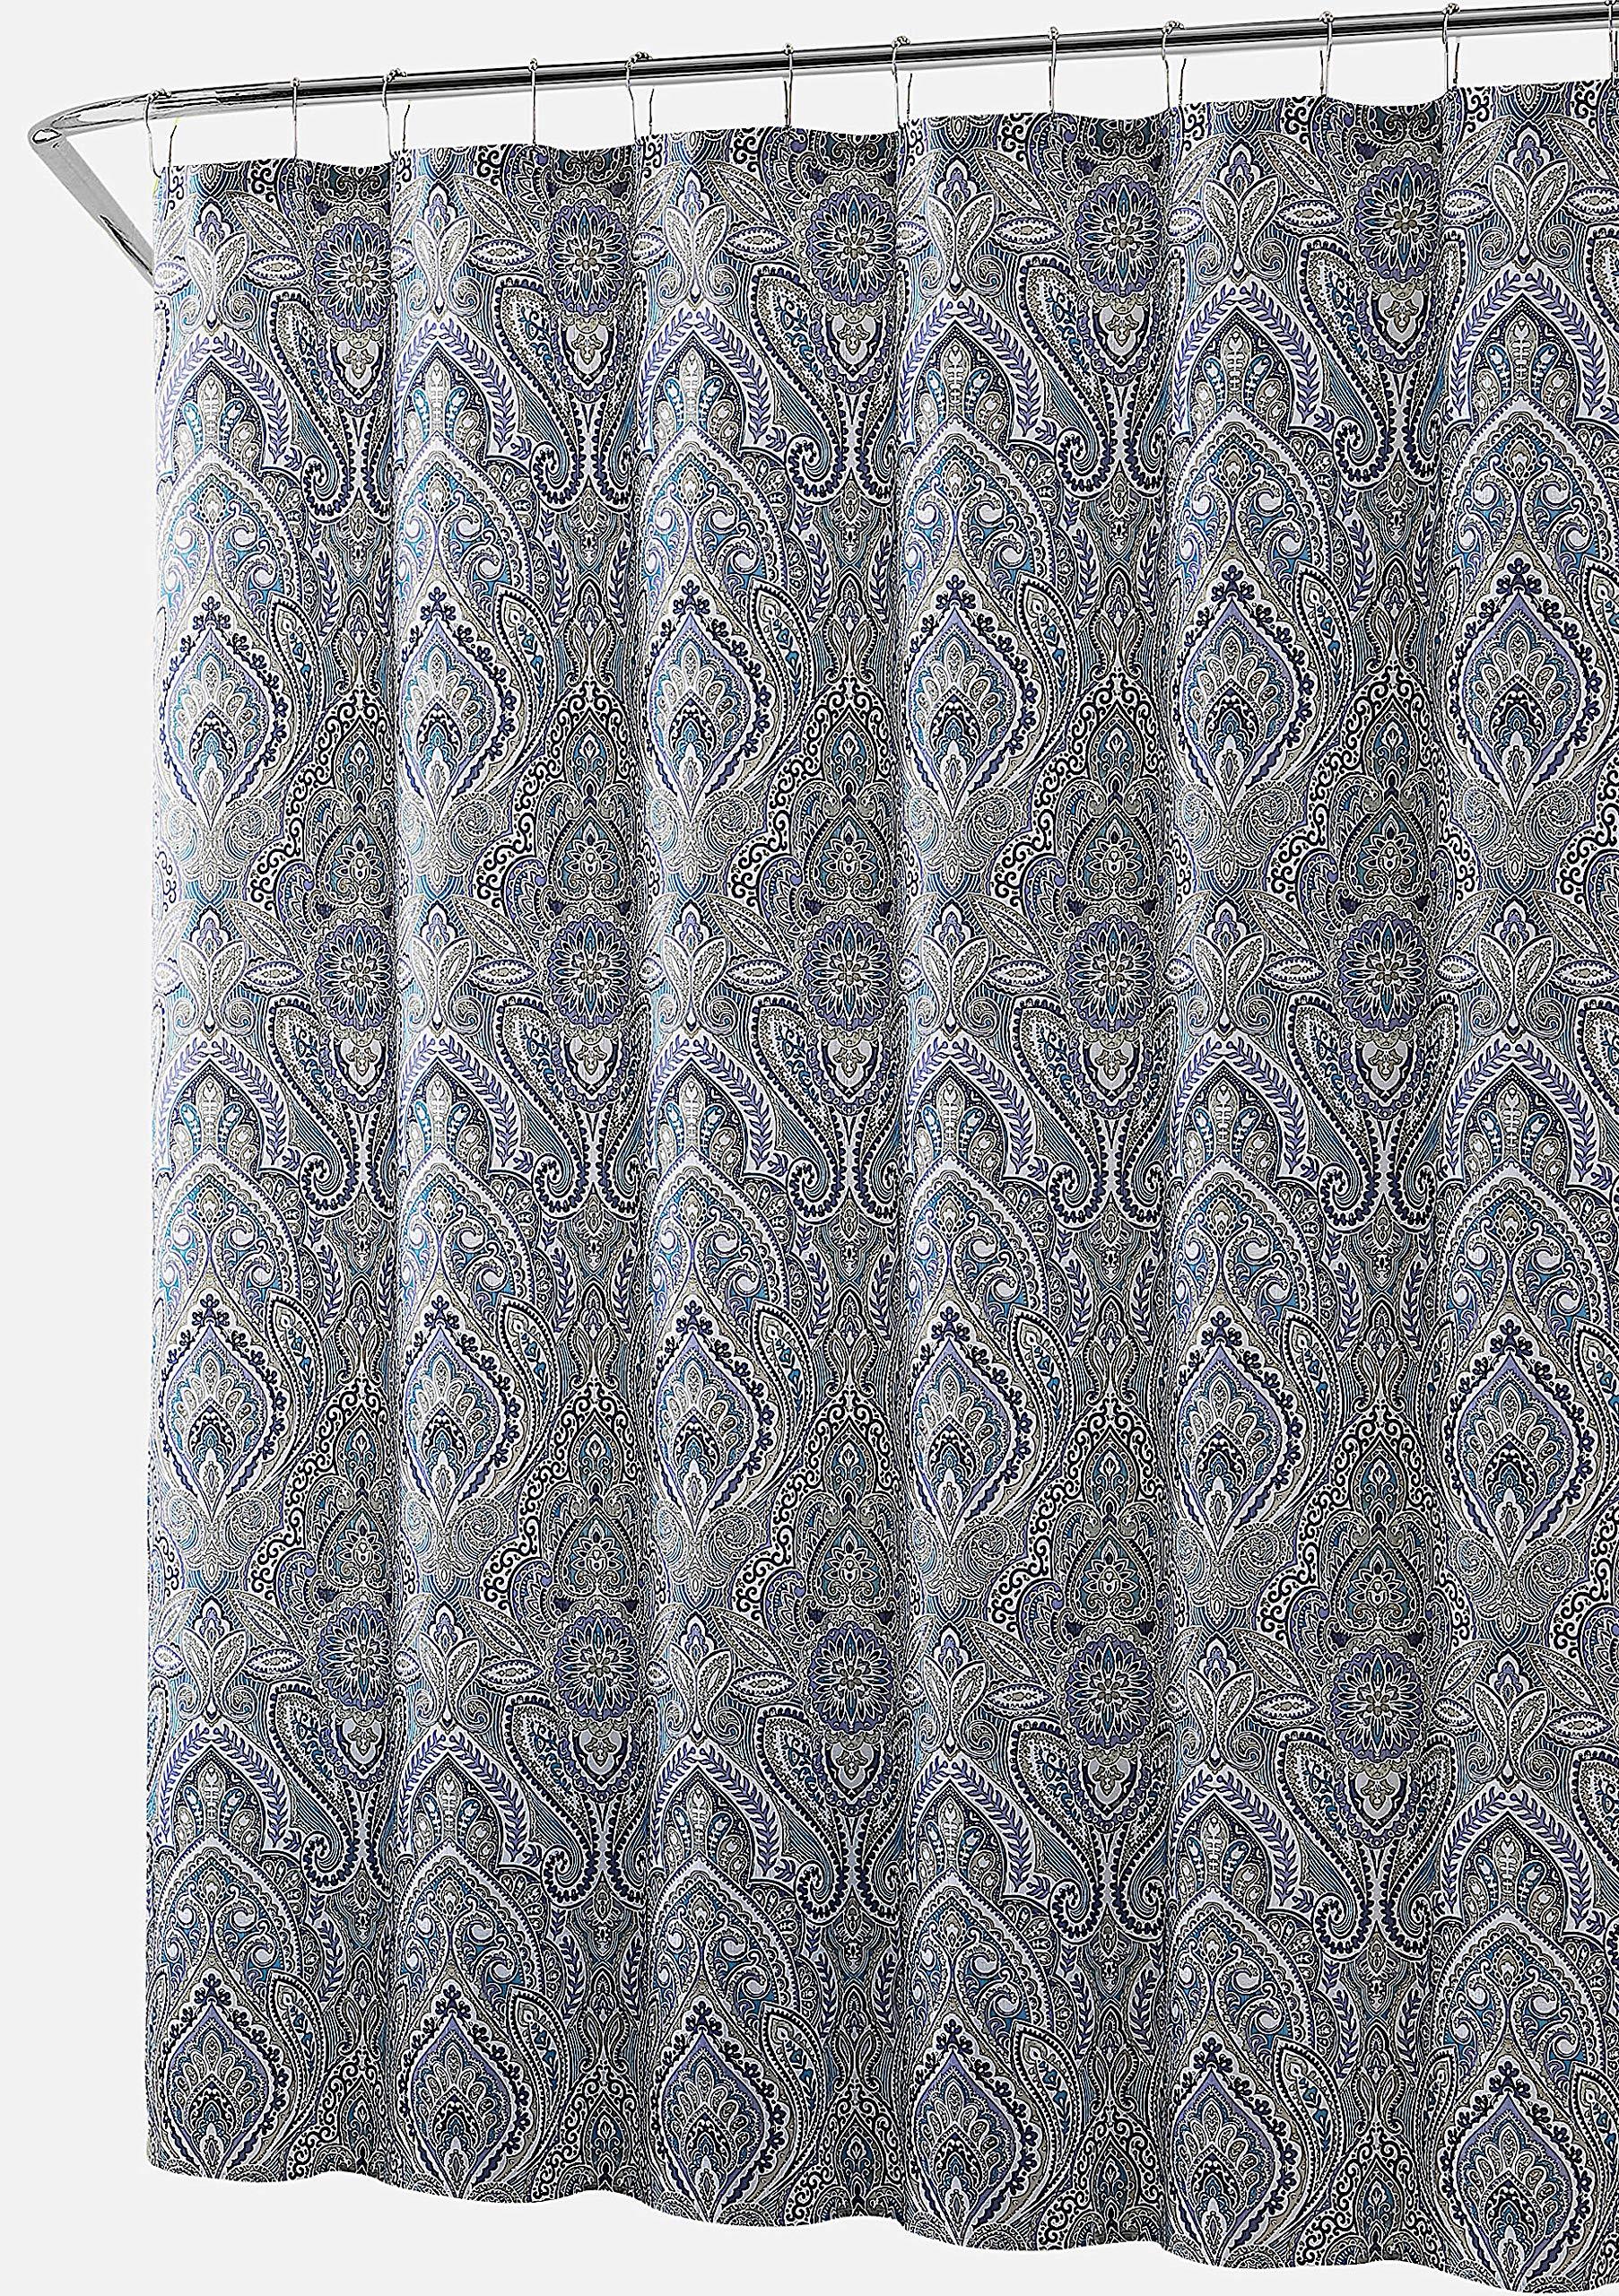 Hudson Essex Blue Purple Green Gold Cloth Fabric Shower Curtain Floral Paisley Print Design 72 X Inch